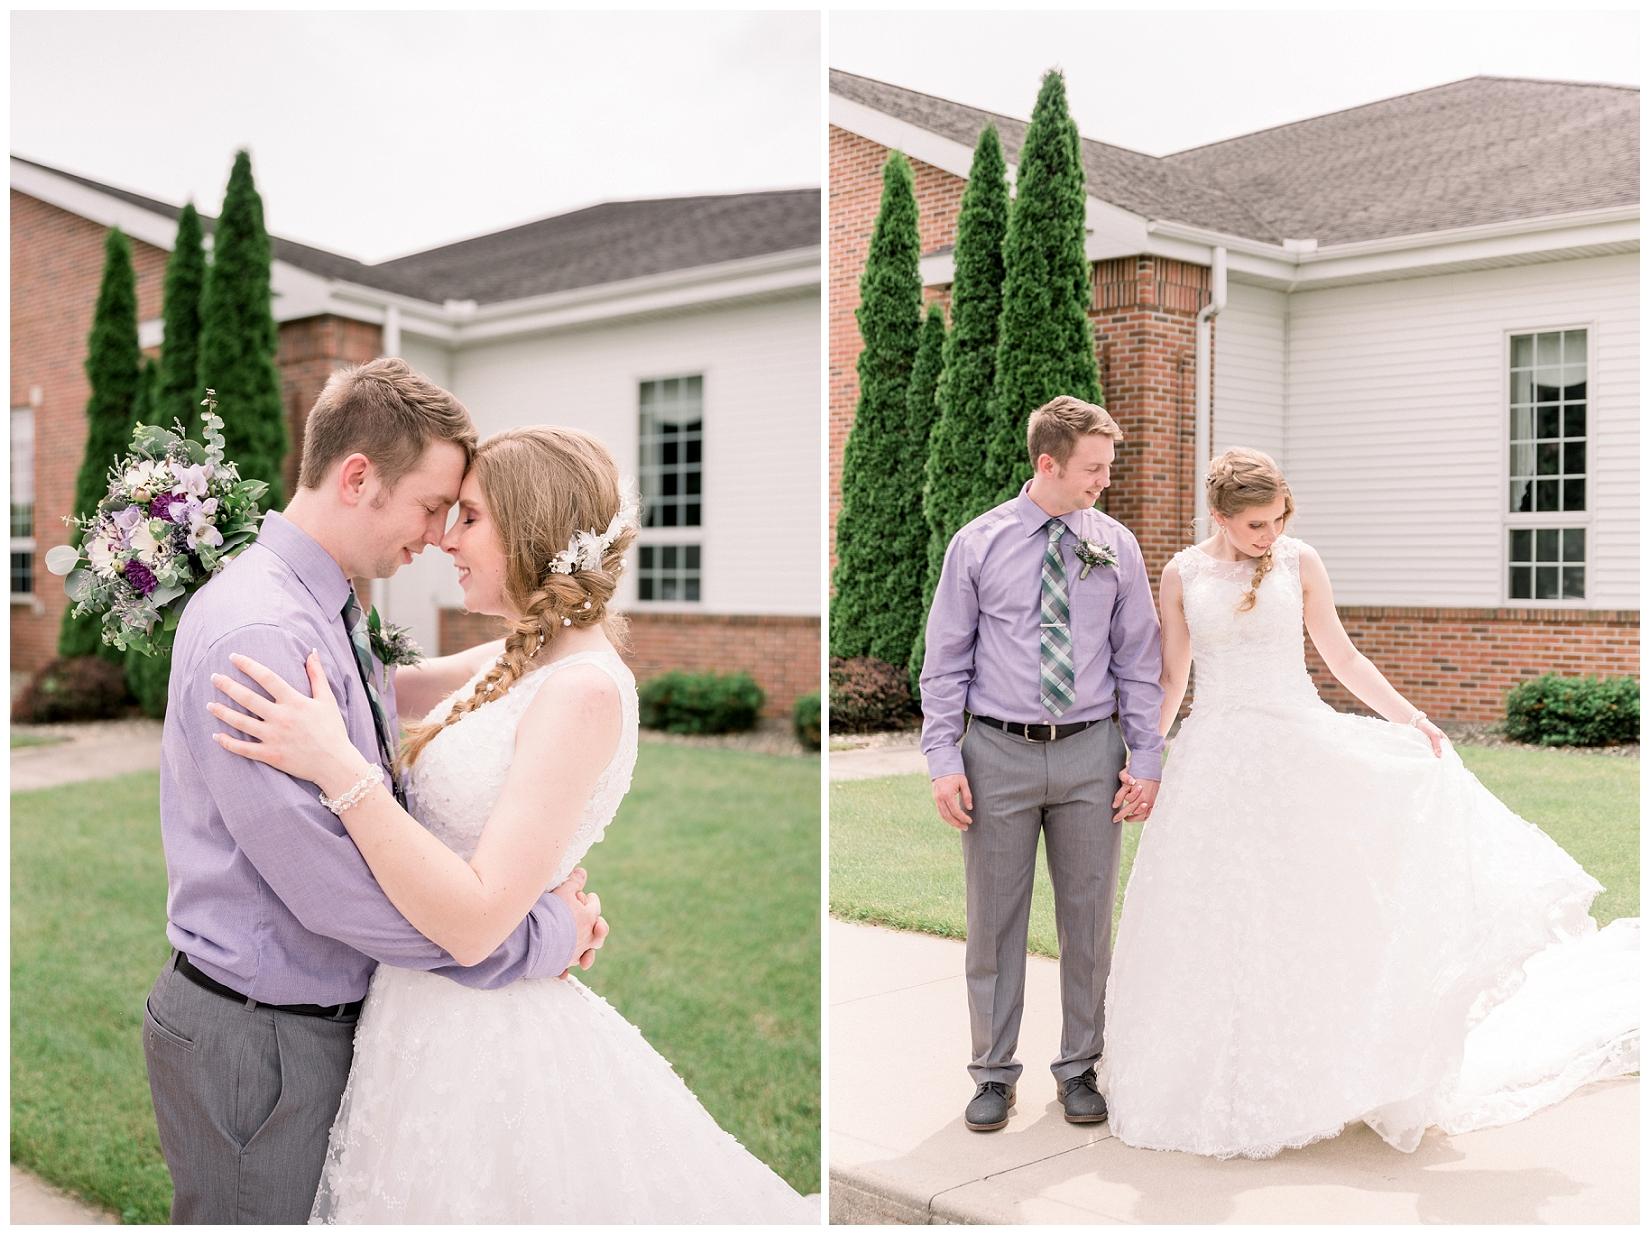 cat-alkire-wedding-photographer-indiana-chicago-indianapolis-fort-wayne_1312.jpg